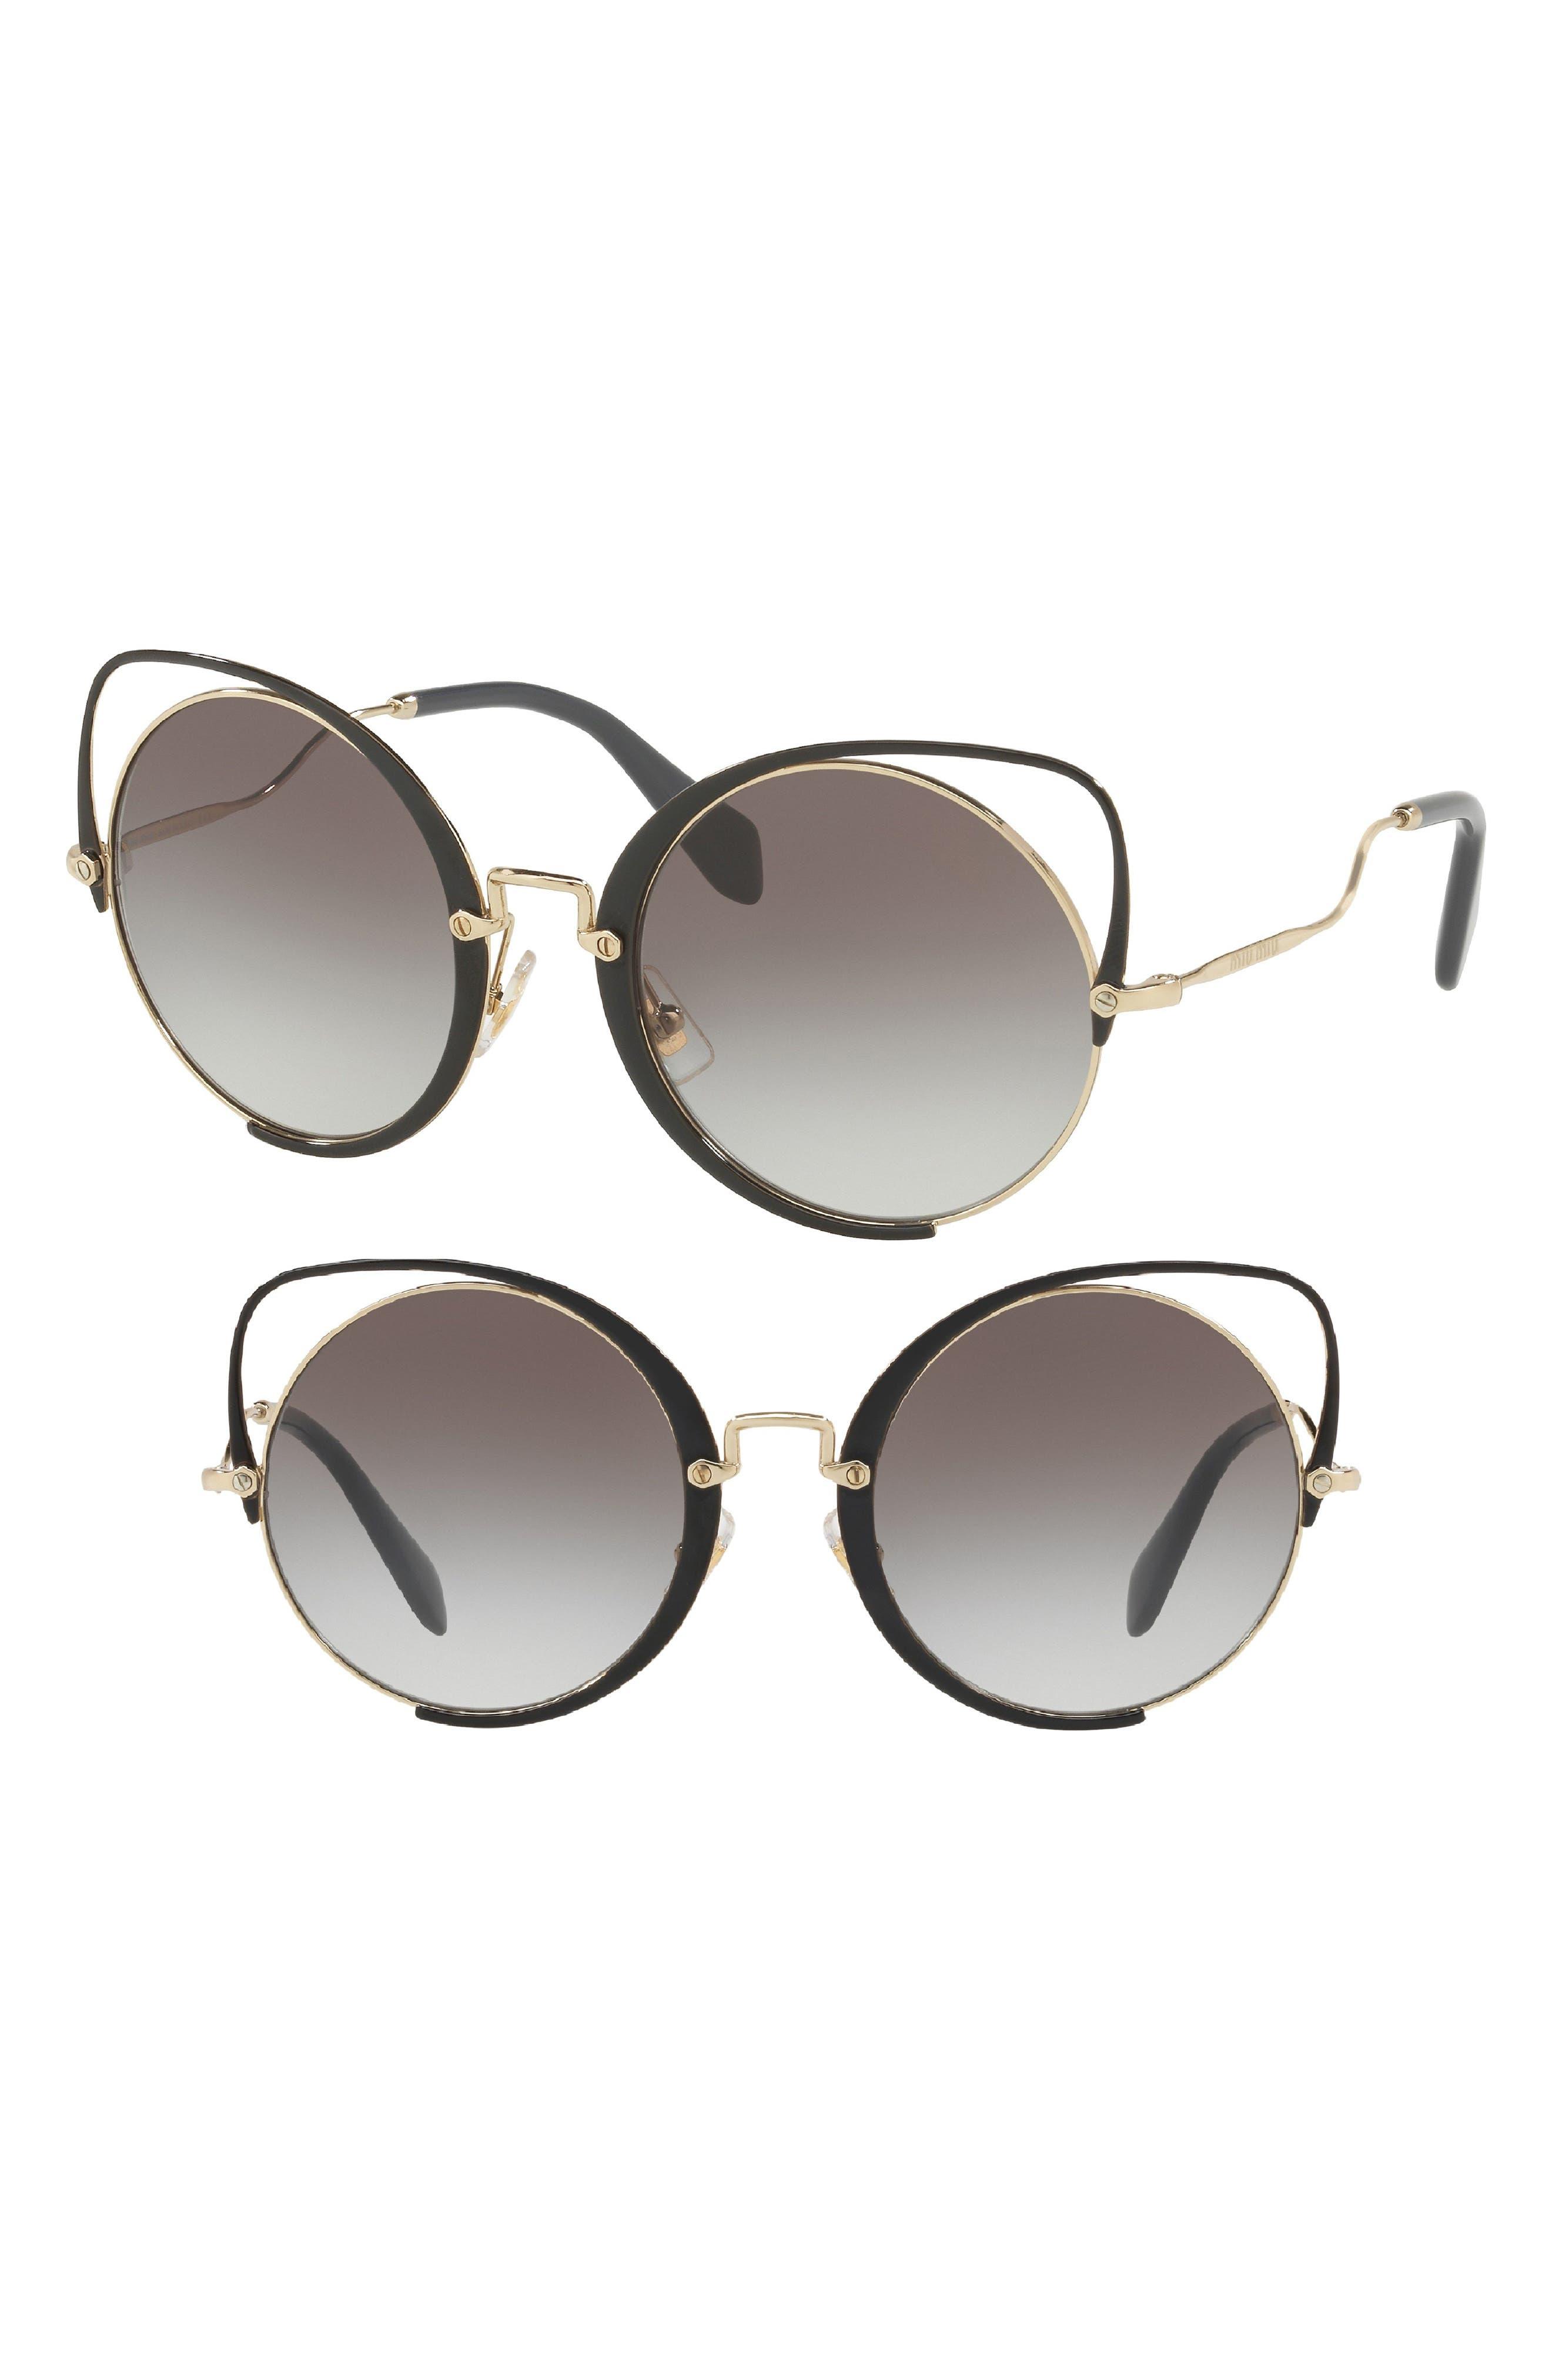 Miu Miu 54mm Gradient Round Lens Cat Eye Sunglasses